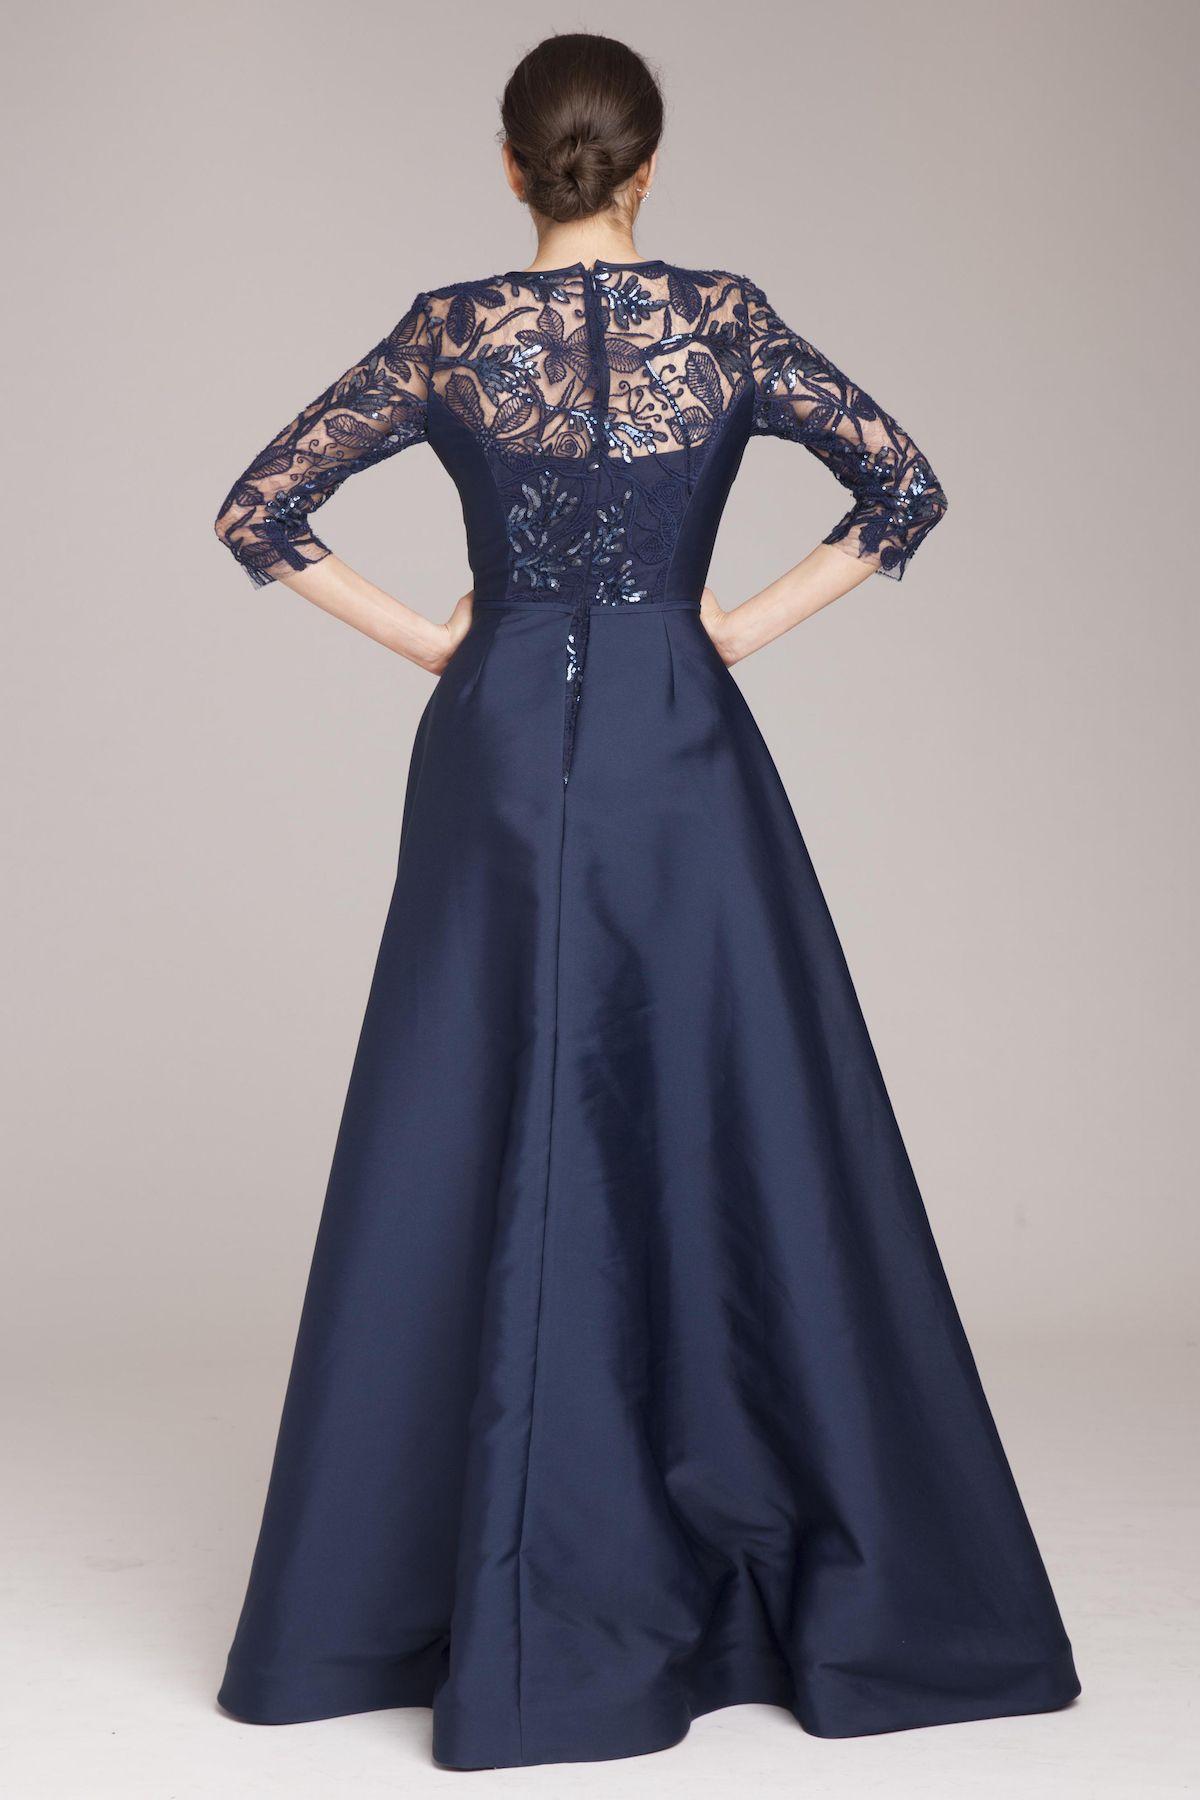 Wedding dress shops in deira dubai  Lace Gown with Taffeta Overlay  Teri Jon  moda fashion  Pinterest